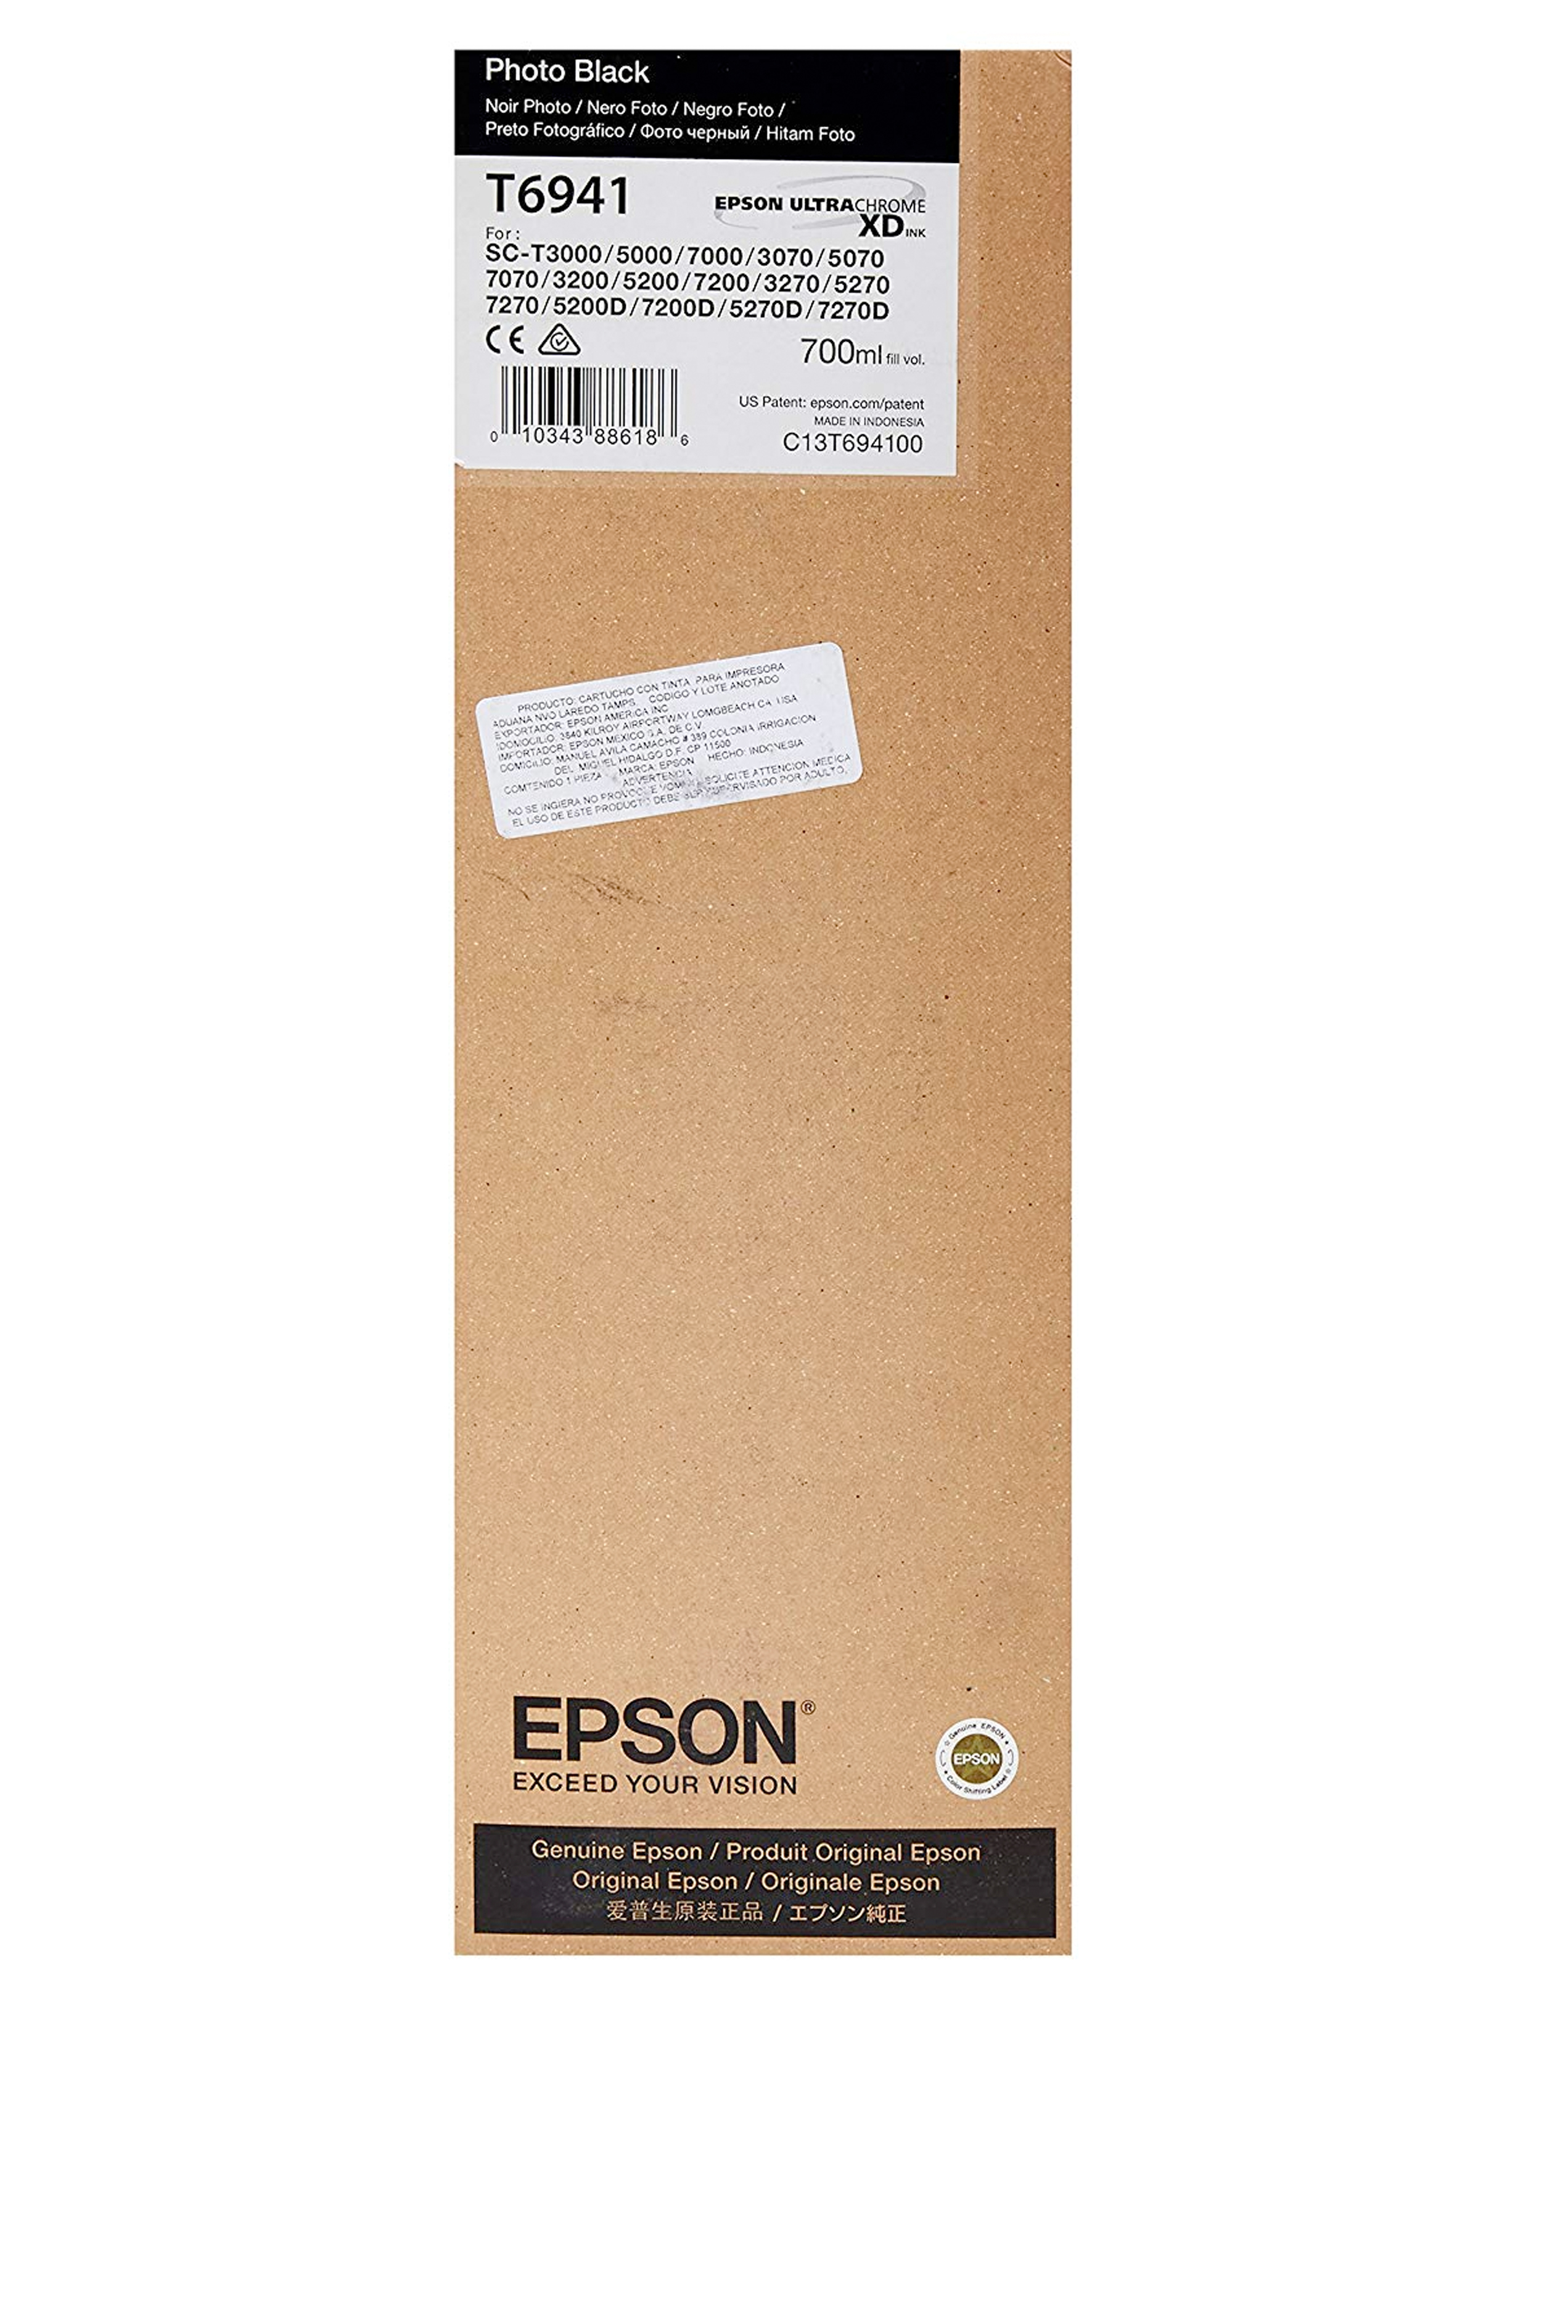 Epson EPSON HI PHOTO BLACK INK (700 ML) (T694100)